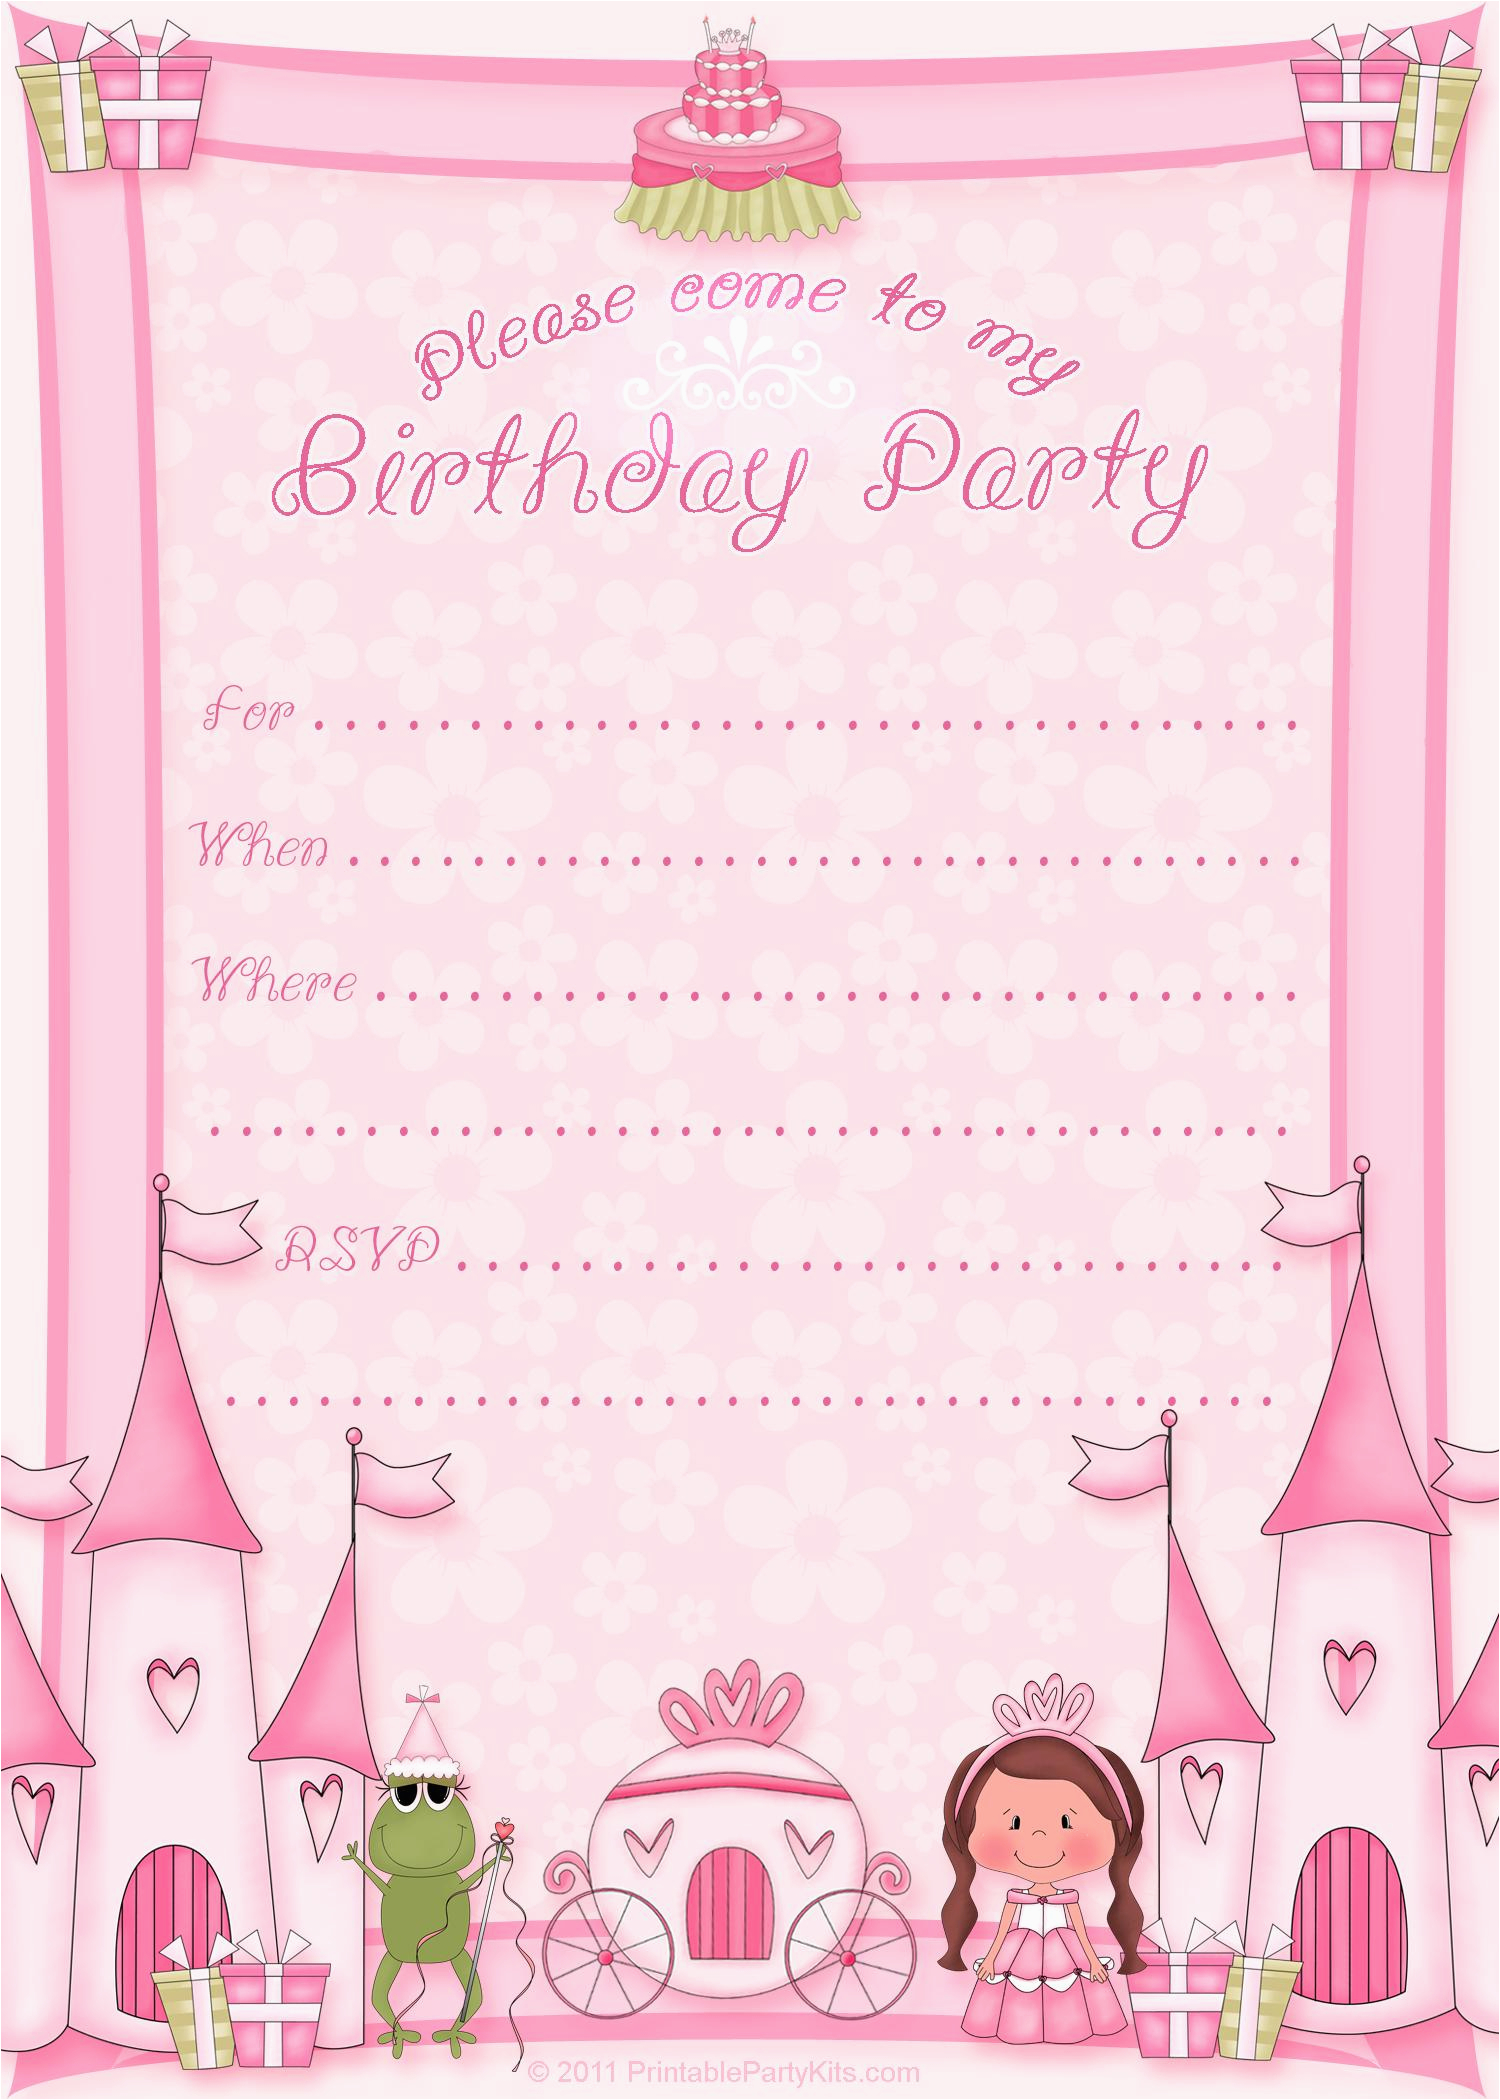 Birthday Invitations Maker Free Party Invitation Maker Party Invitations Templates